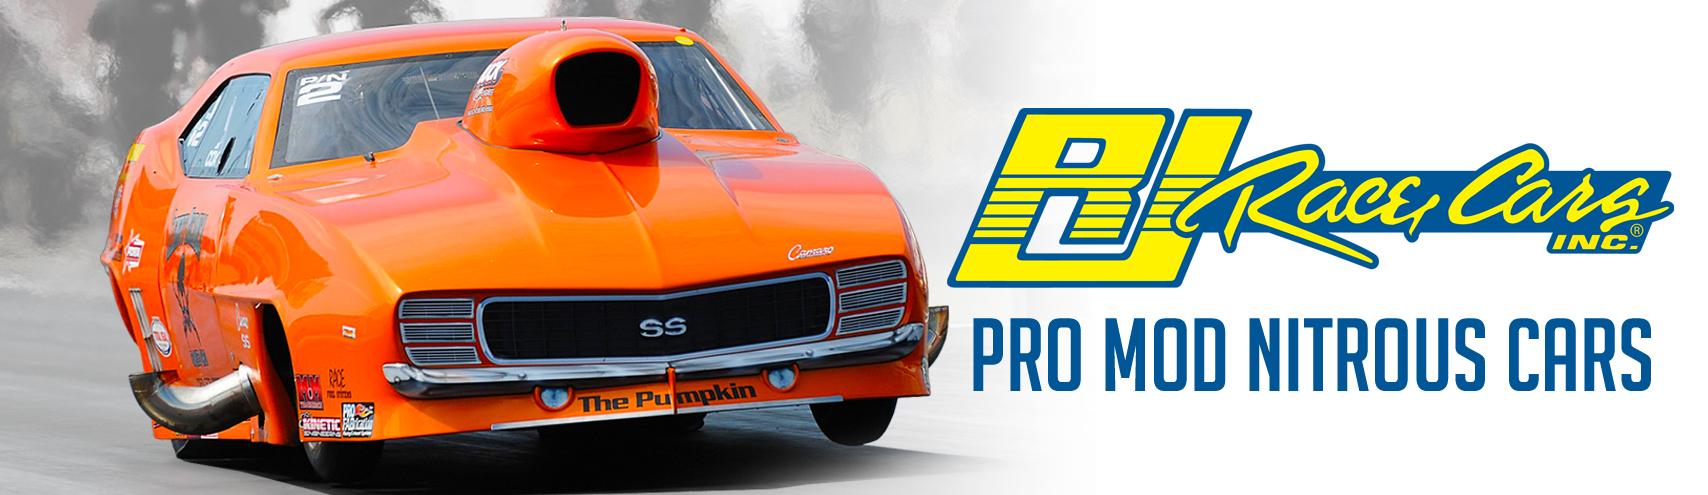 pro-mod-nitrous-cars-banner.jpg